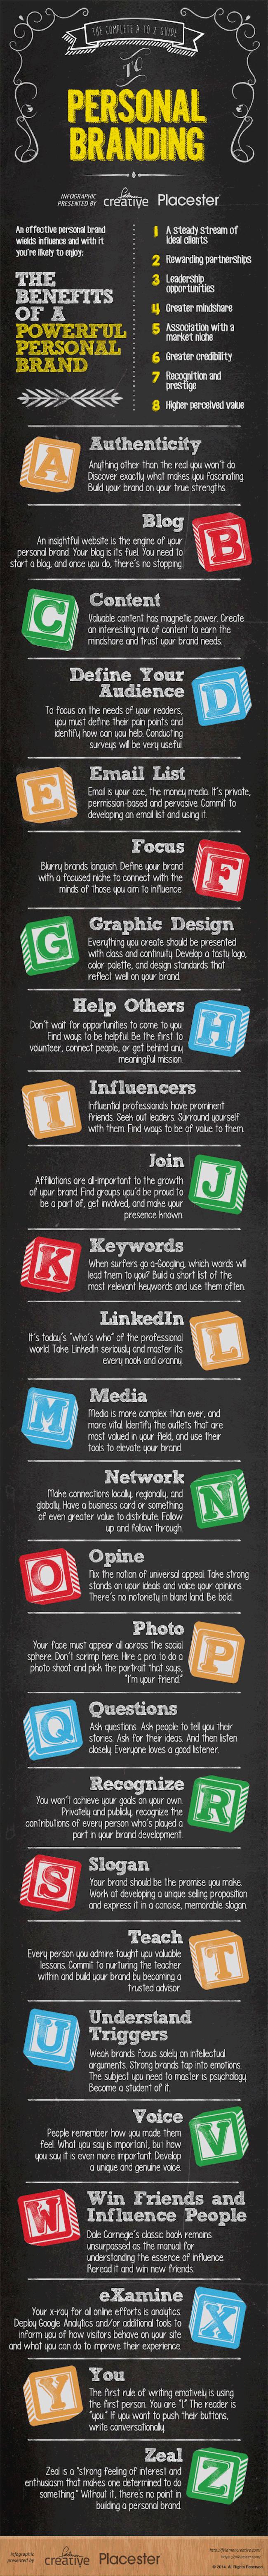 personal-branding-infographic